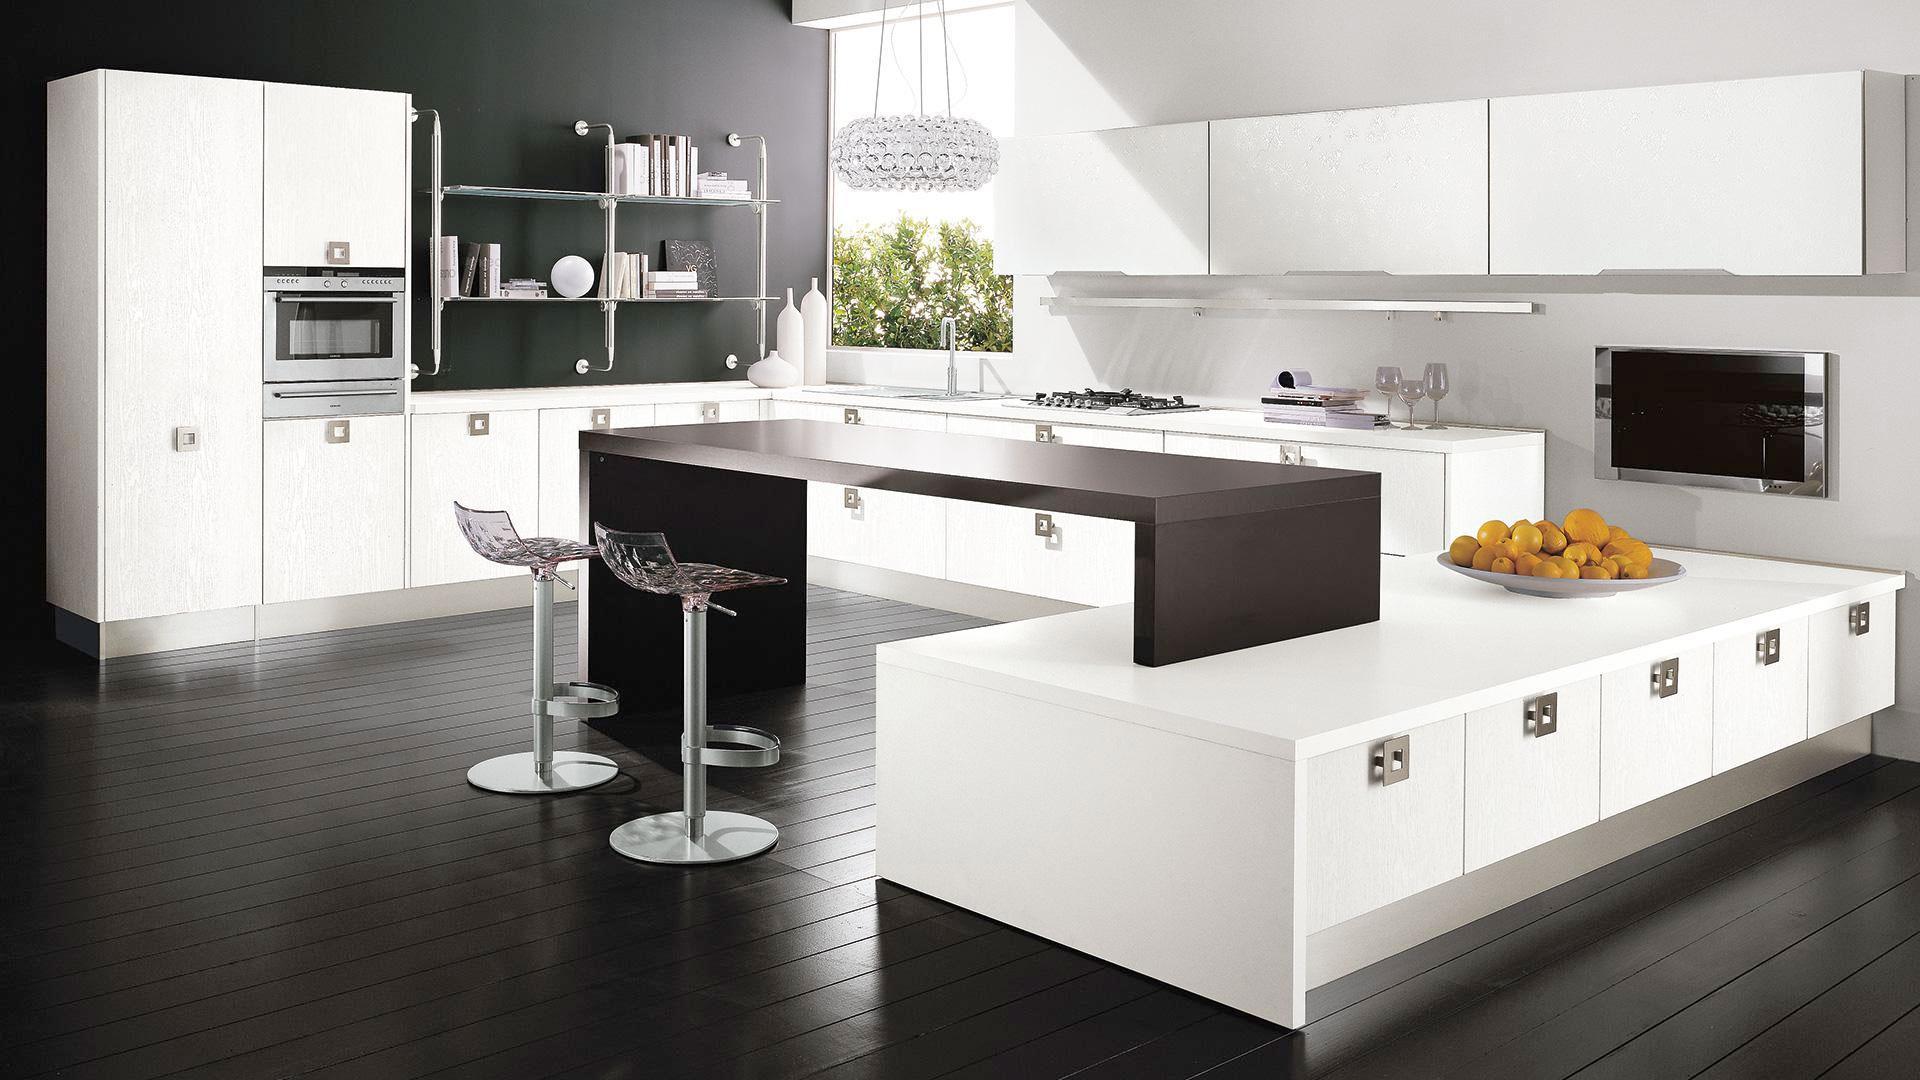 Comporre la cucina good emejing progetta la tua cucina - Comporre cucina ...